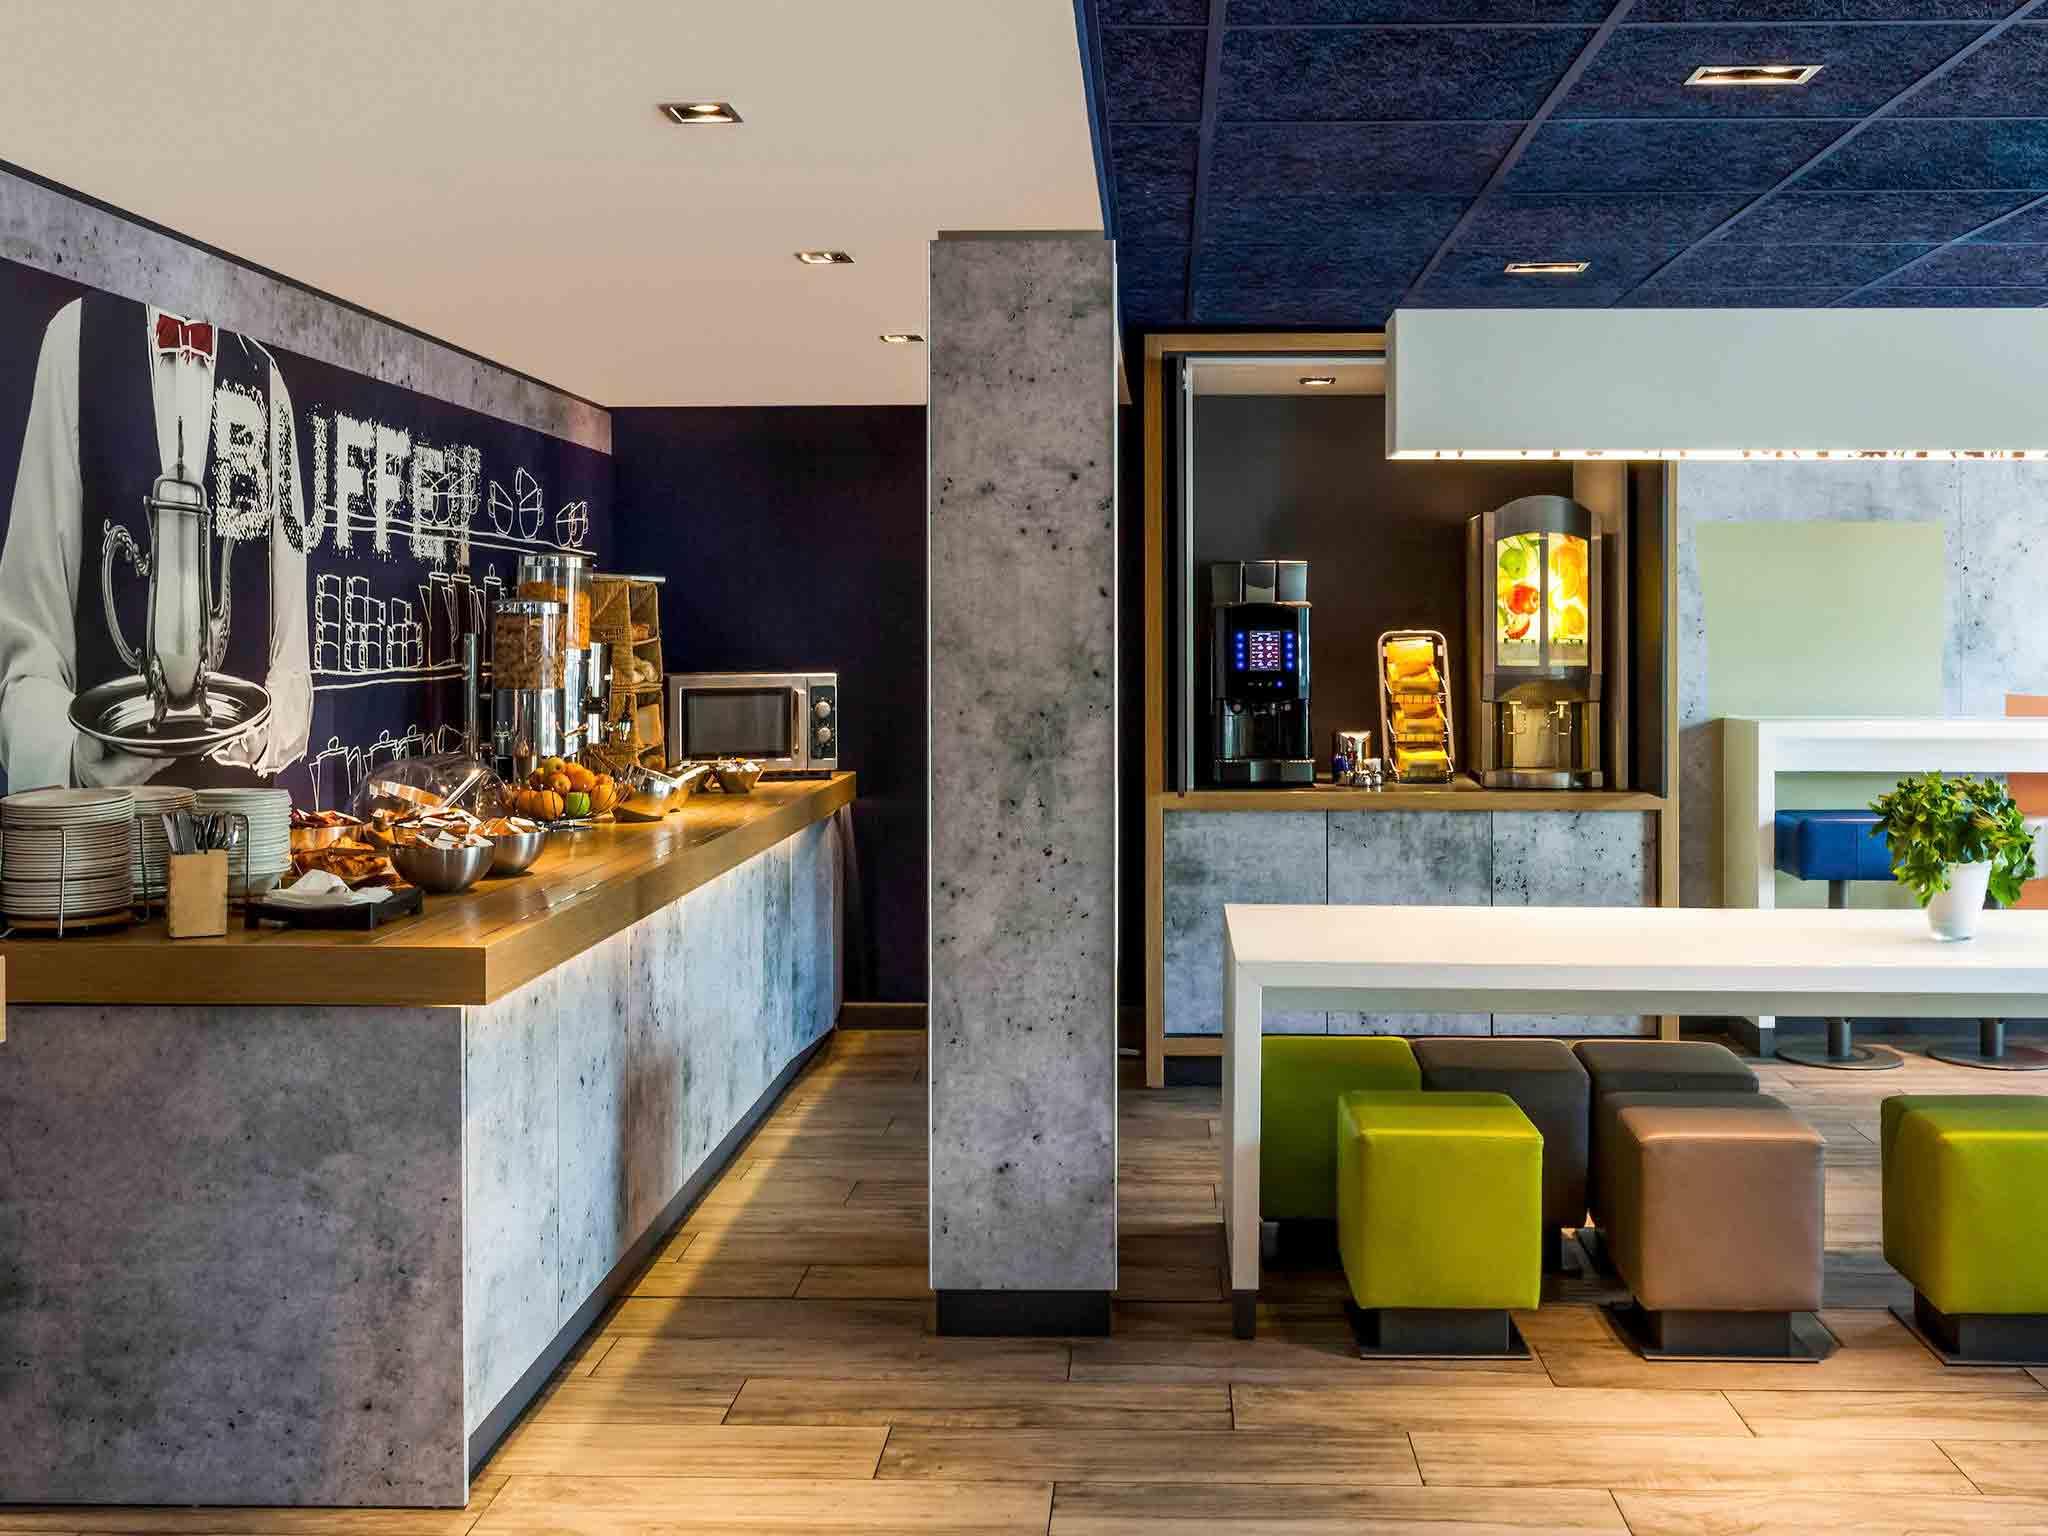 Hotel en londres ibis budget londres city aeropuerto for Hotel adagio londres